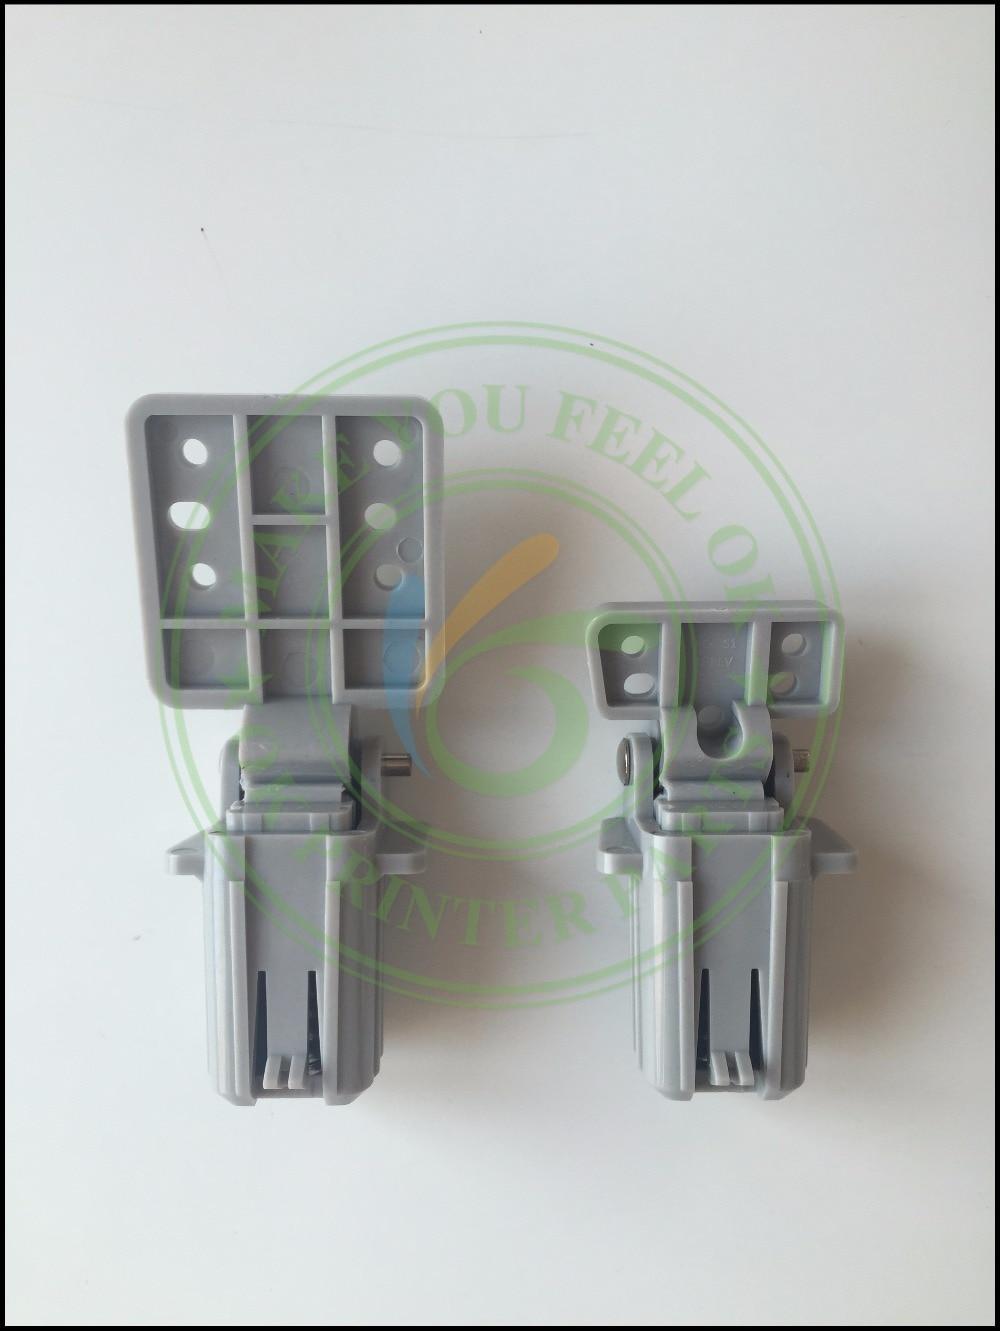 1SET X NEW Q3948-67905 Q394867905 ADF Assembly Hinge Kit for HP CM2320 2820 2830 2840 CM1312 3390 3392 M2727 q3948 67904 adf pickup roller separation pad for hp 2820 2840 cm1312 cm2320 3050 3052 3055 3390 3392 m1522 m2727 m375 m475